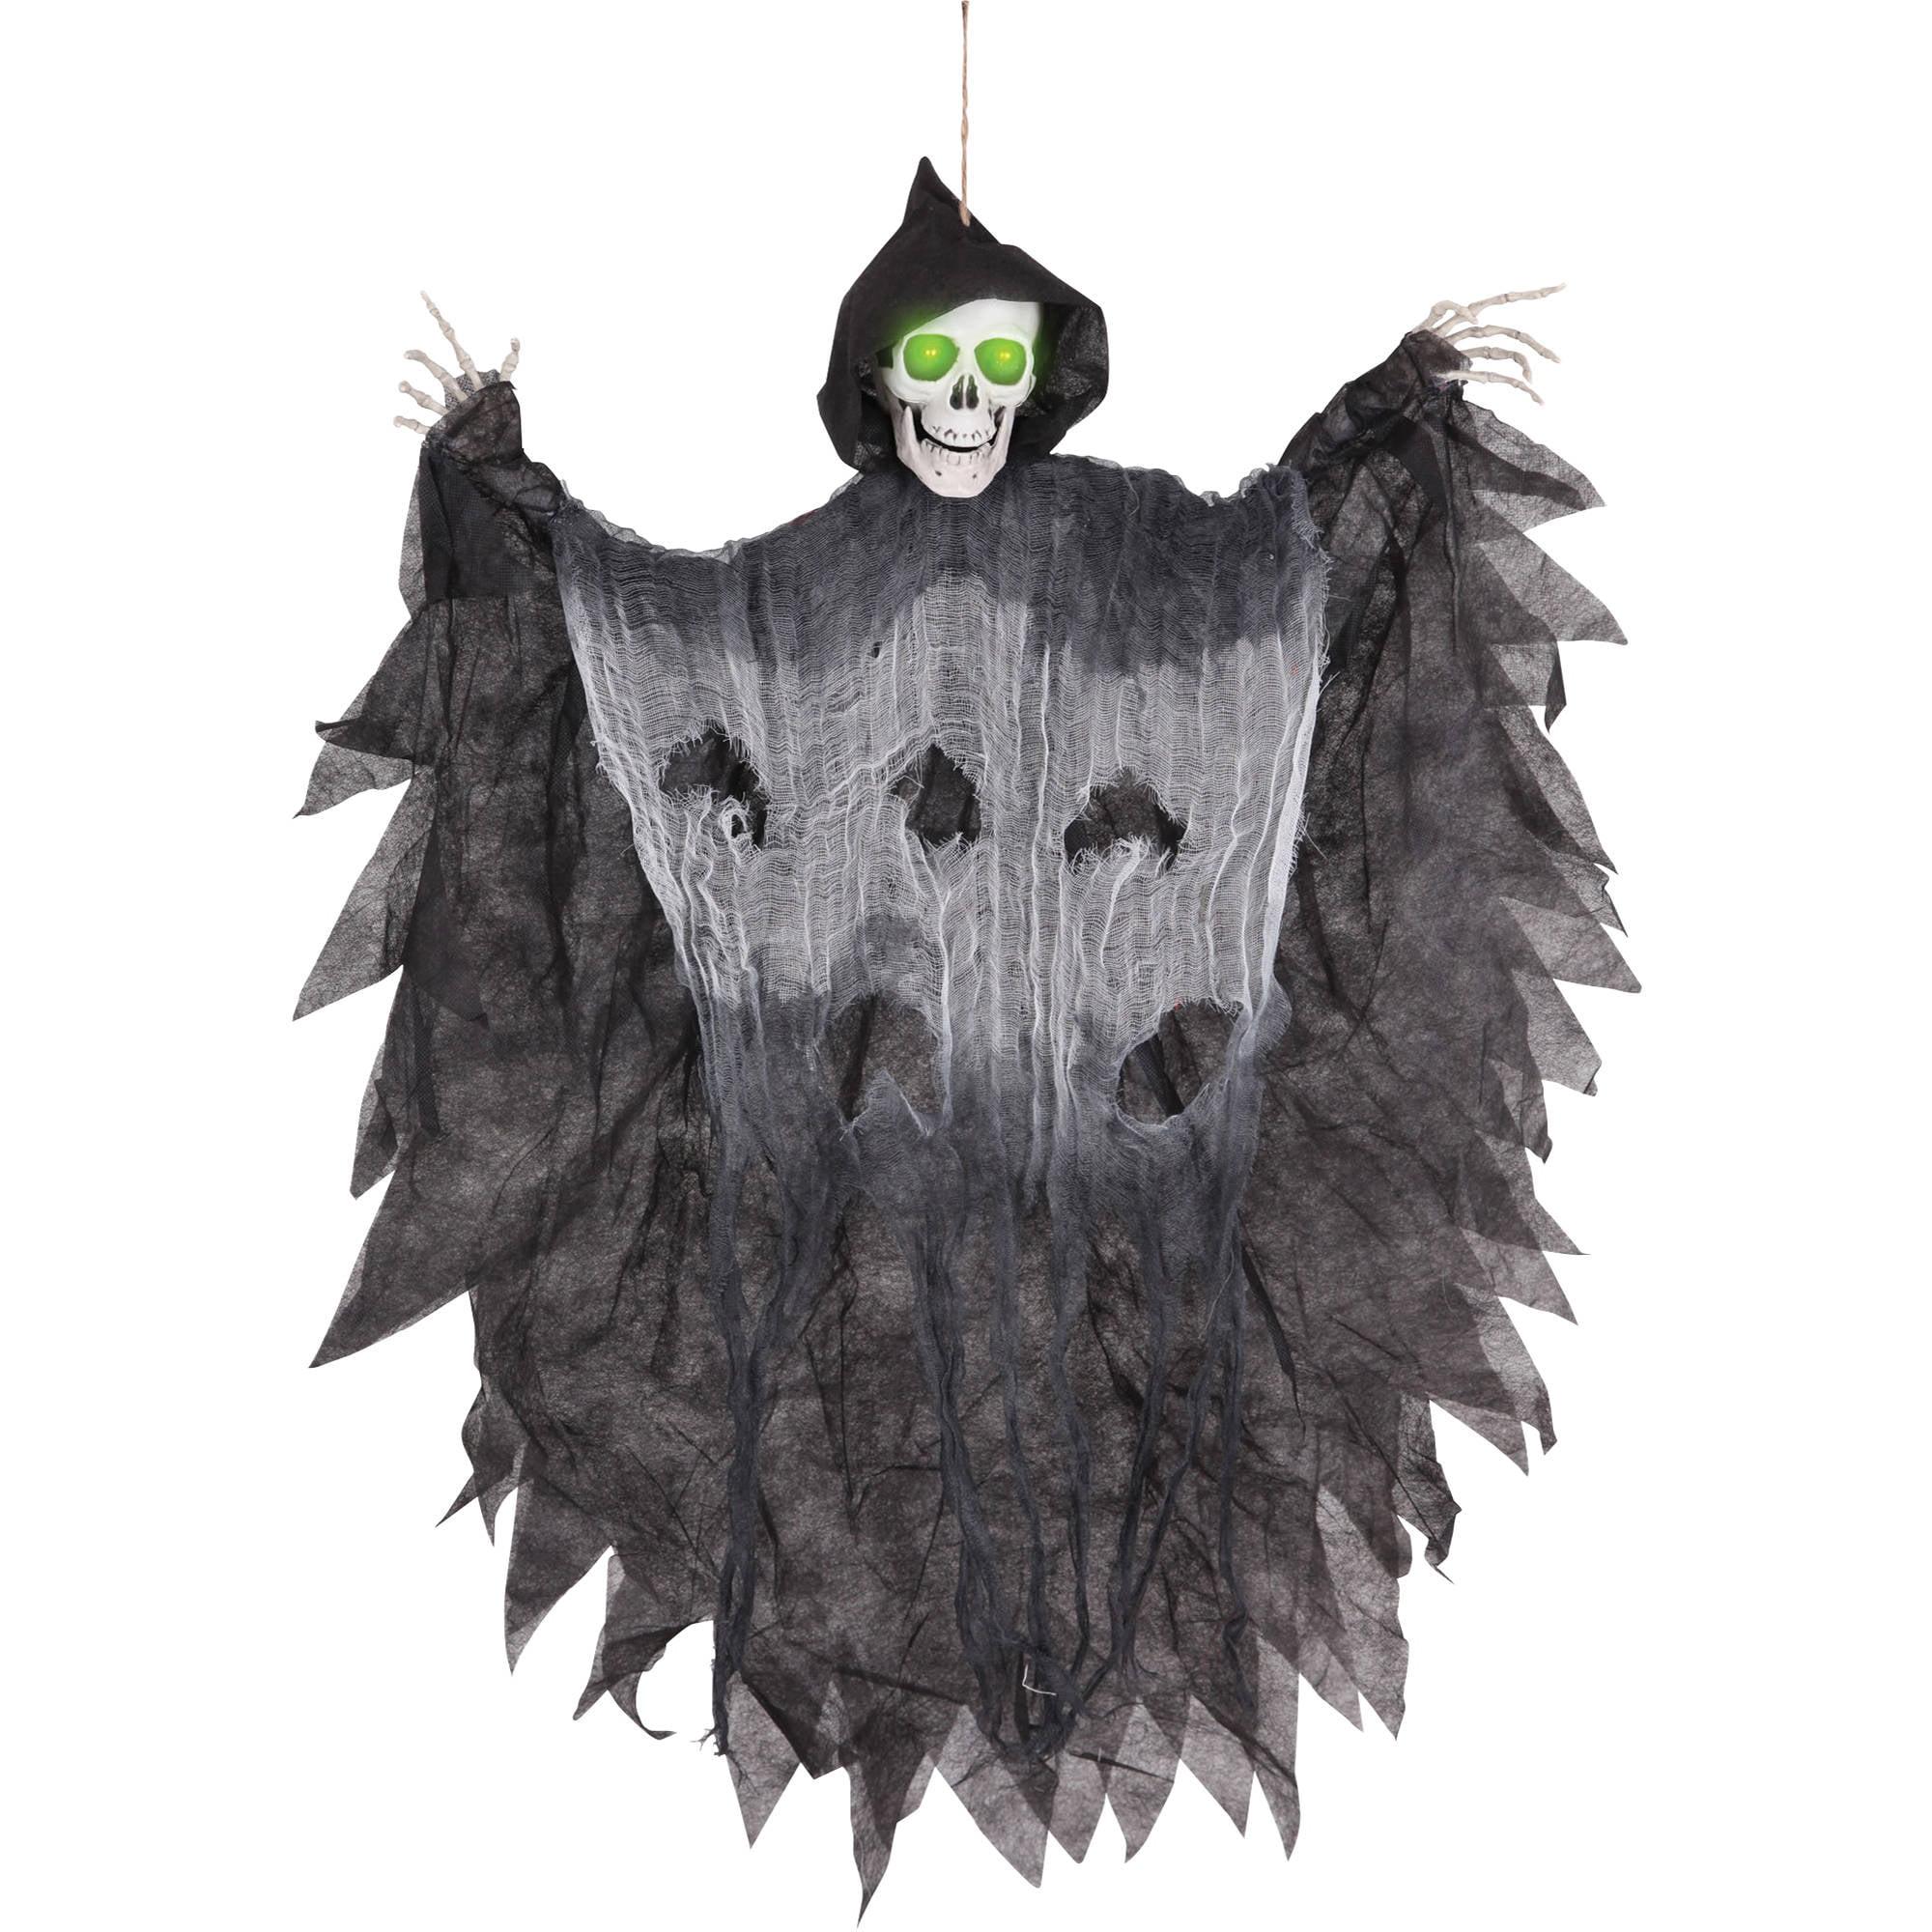 Hanging Reaper 3ft Light Up Halloween Decoration